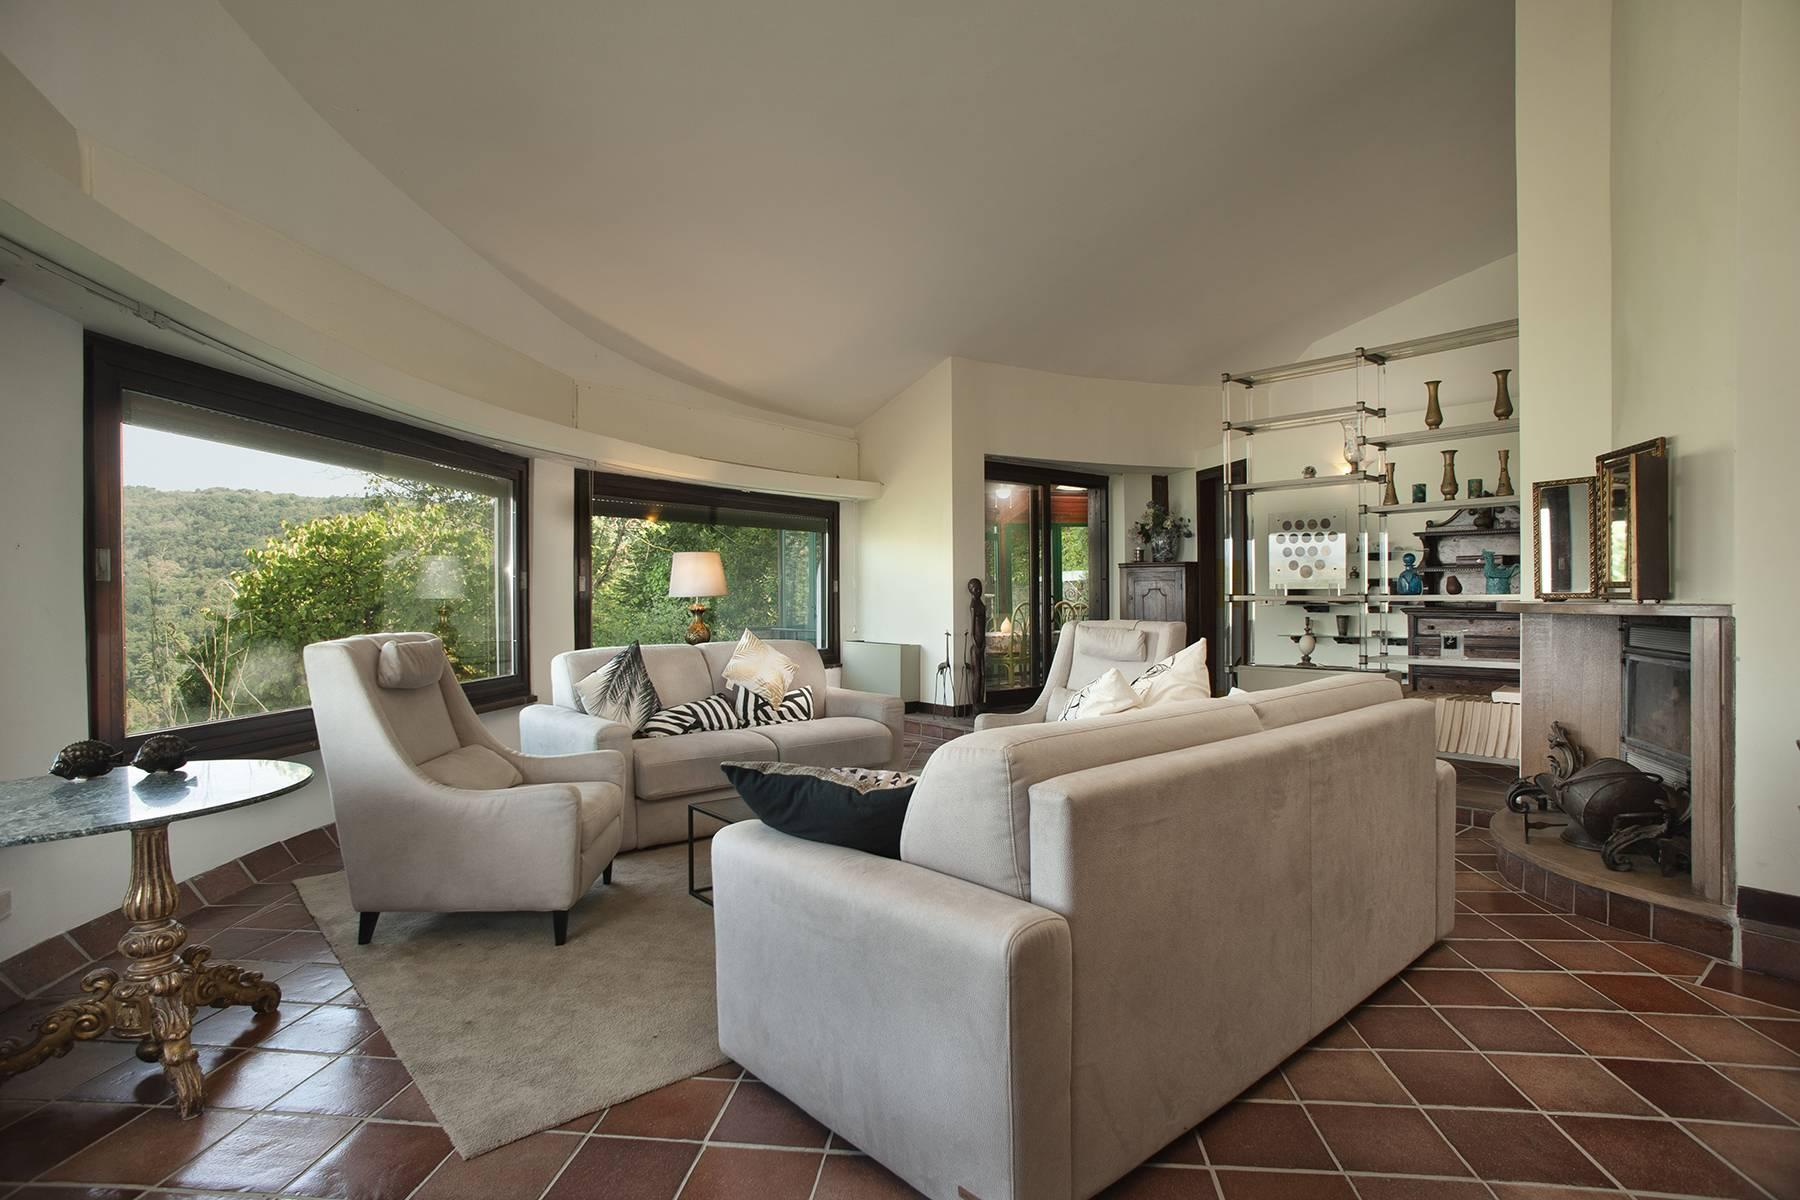 Moderne Villa mit Panorama Blick am Trevigiano See - 1